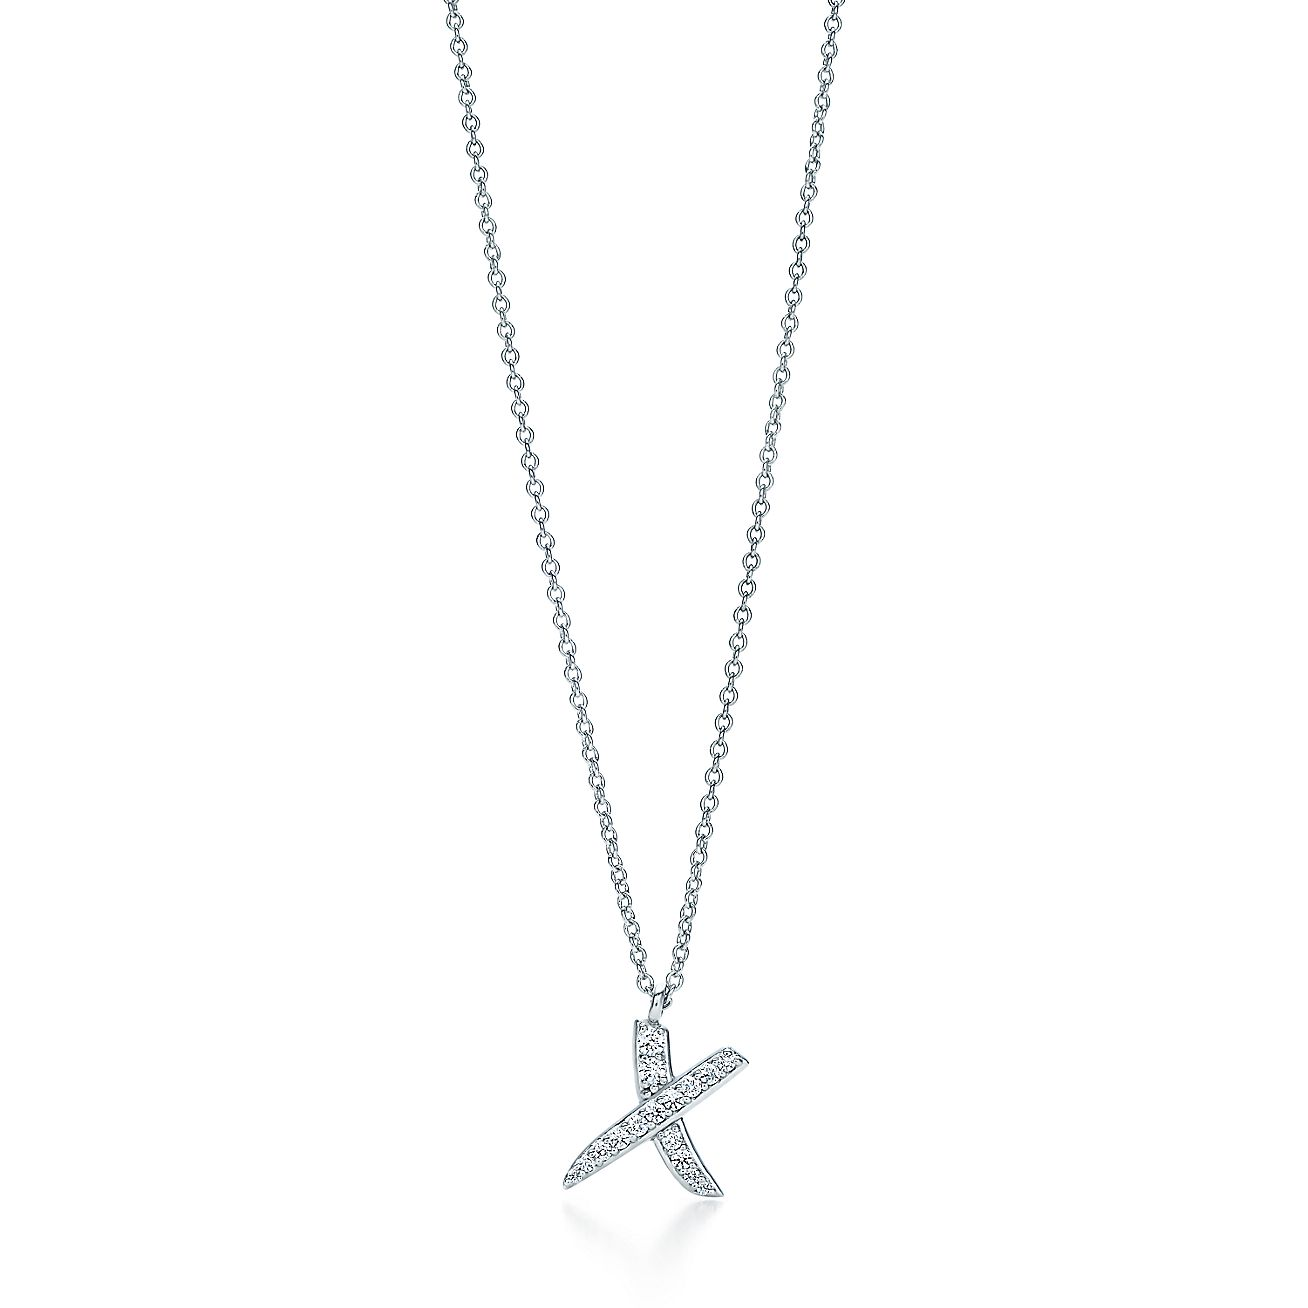 Paloma's X:Pendant